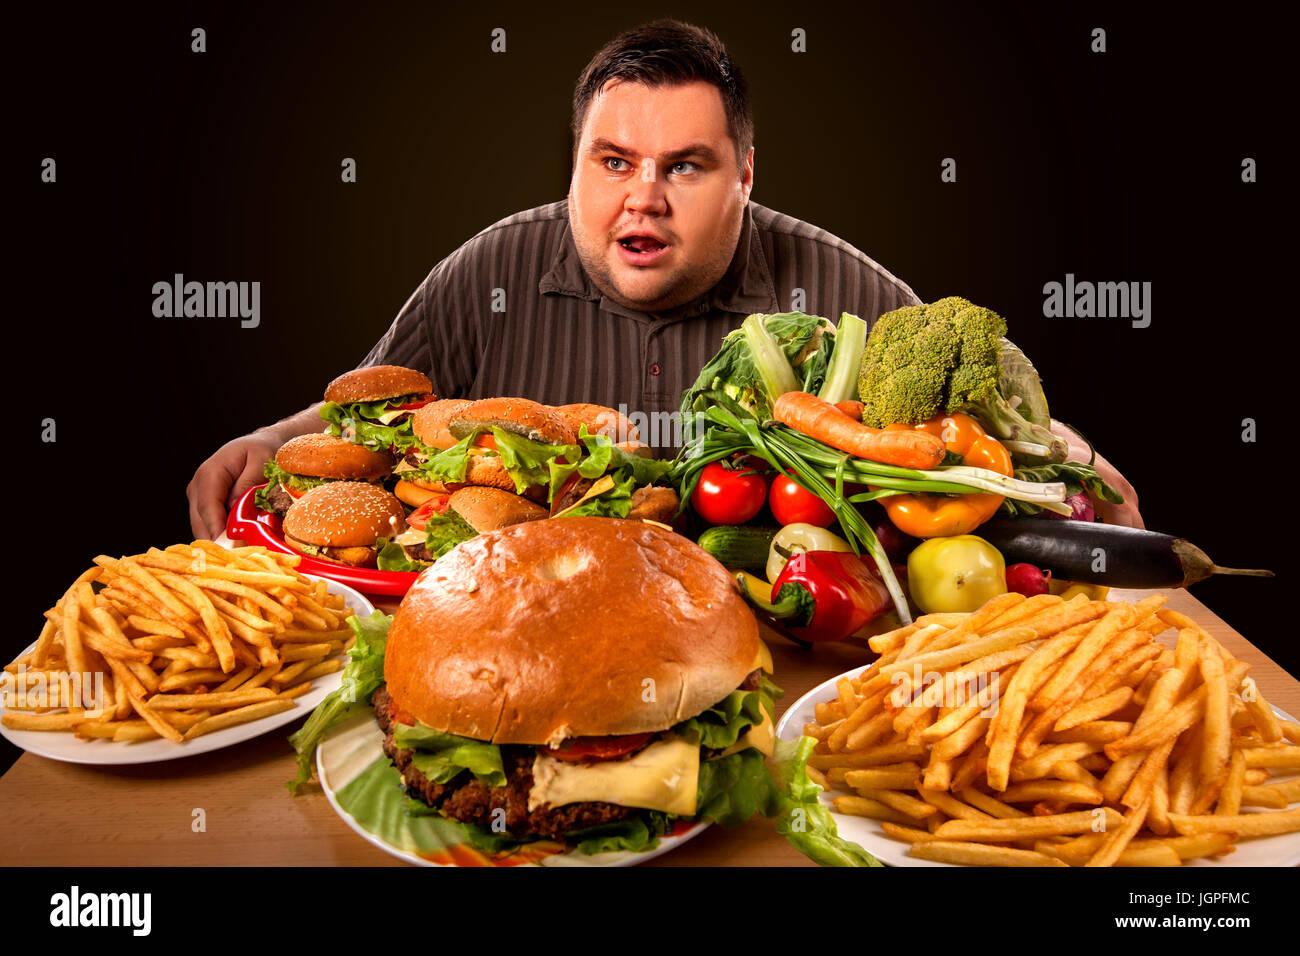 Big Choice Of Fast Food